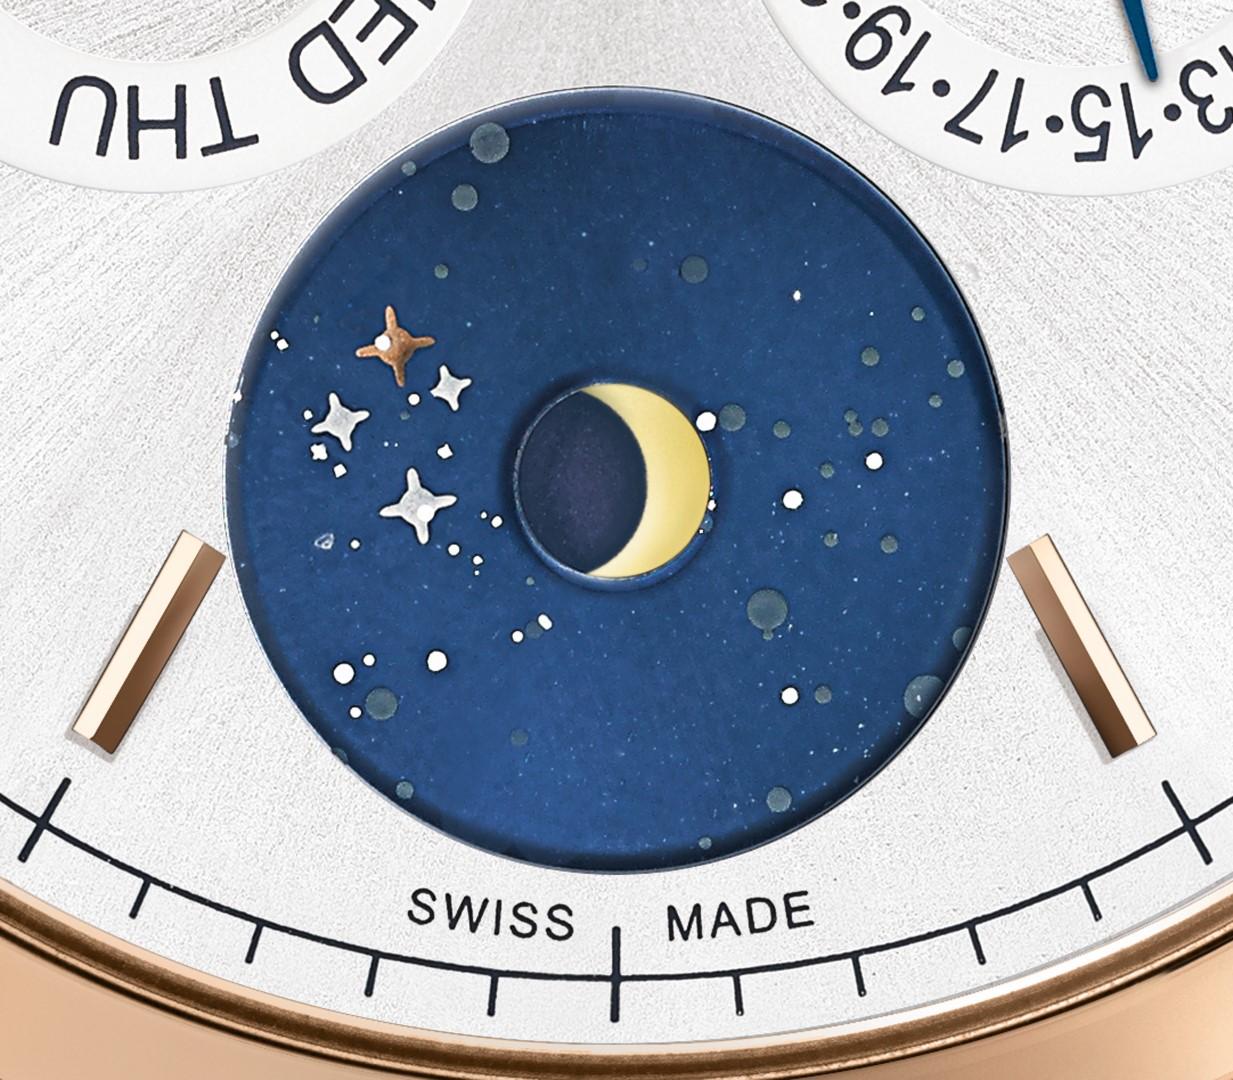 Montblanc Heritage Chronométrie Heritage Quantième Annuel Vasco da Gama - fases lunares